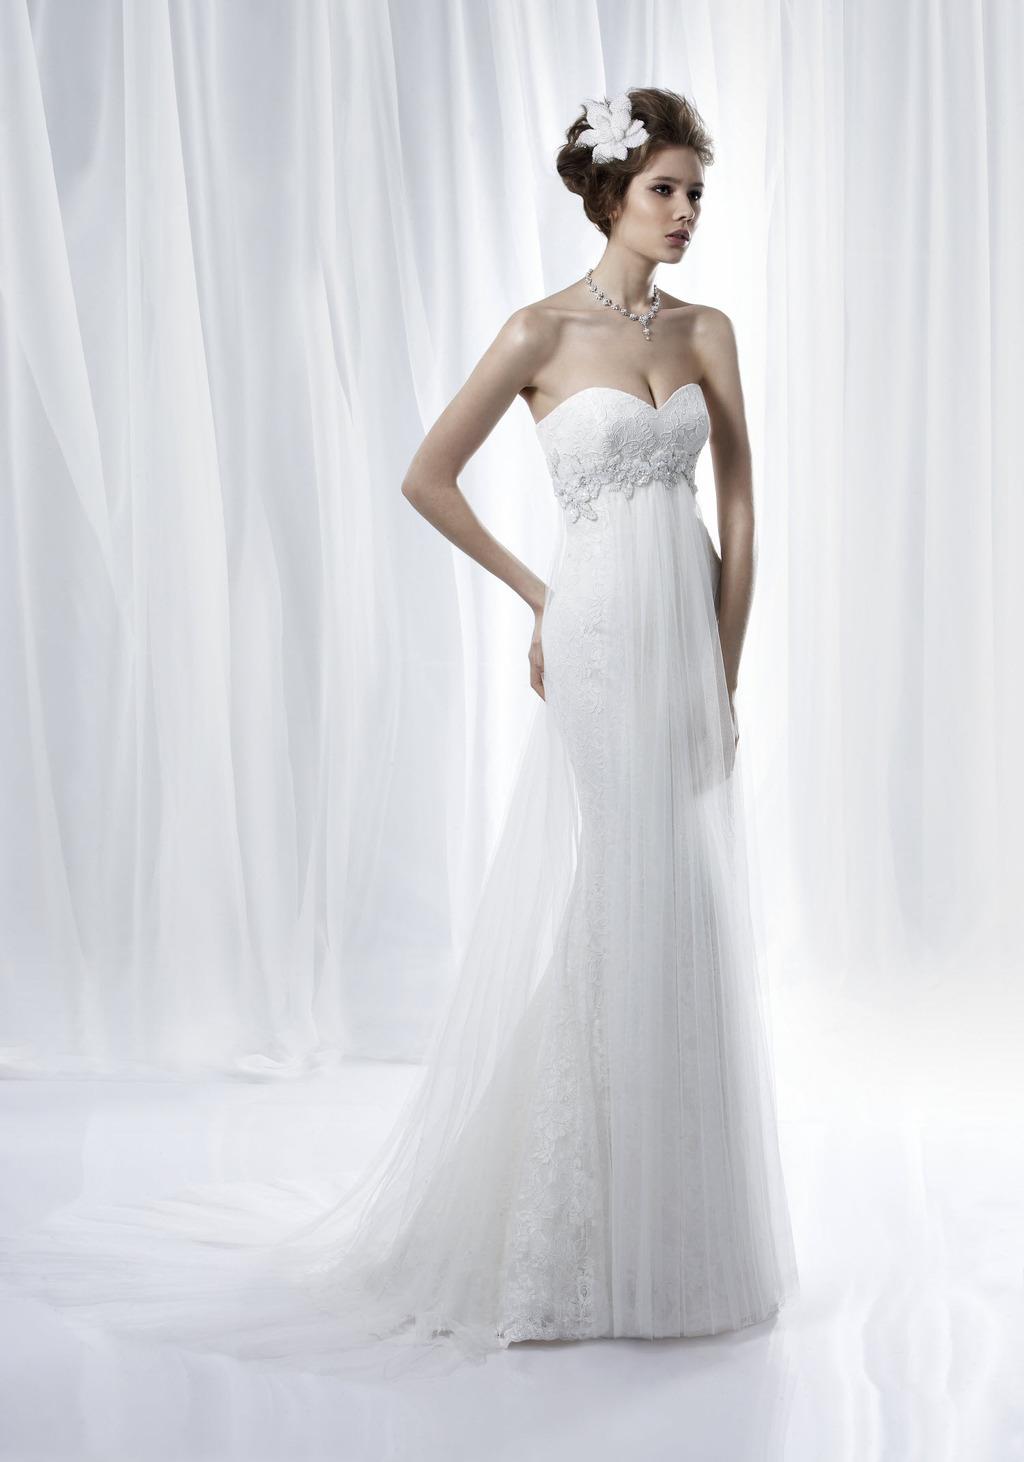 Anjolique-a202a-2012-wedding-dress-sheath-column-romantic-bridal-gown-lace-beading.full